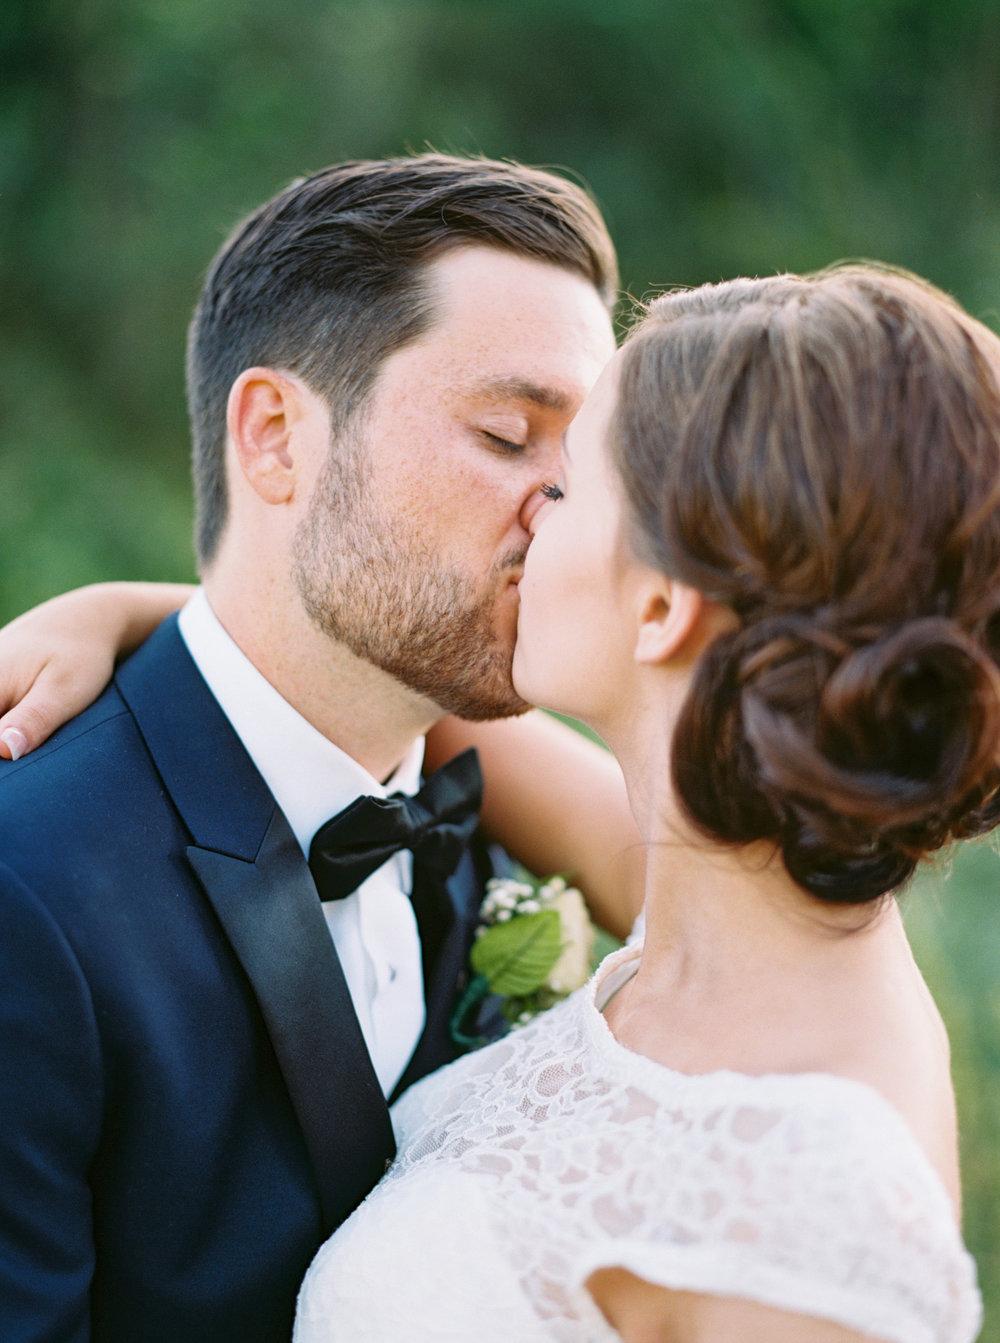 Quiton_Katie Kansas Wedding-0009.jpg